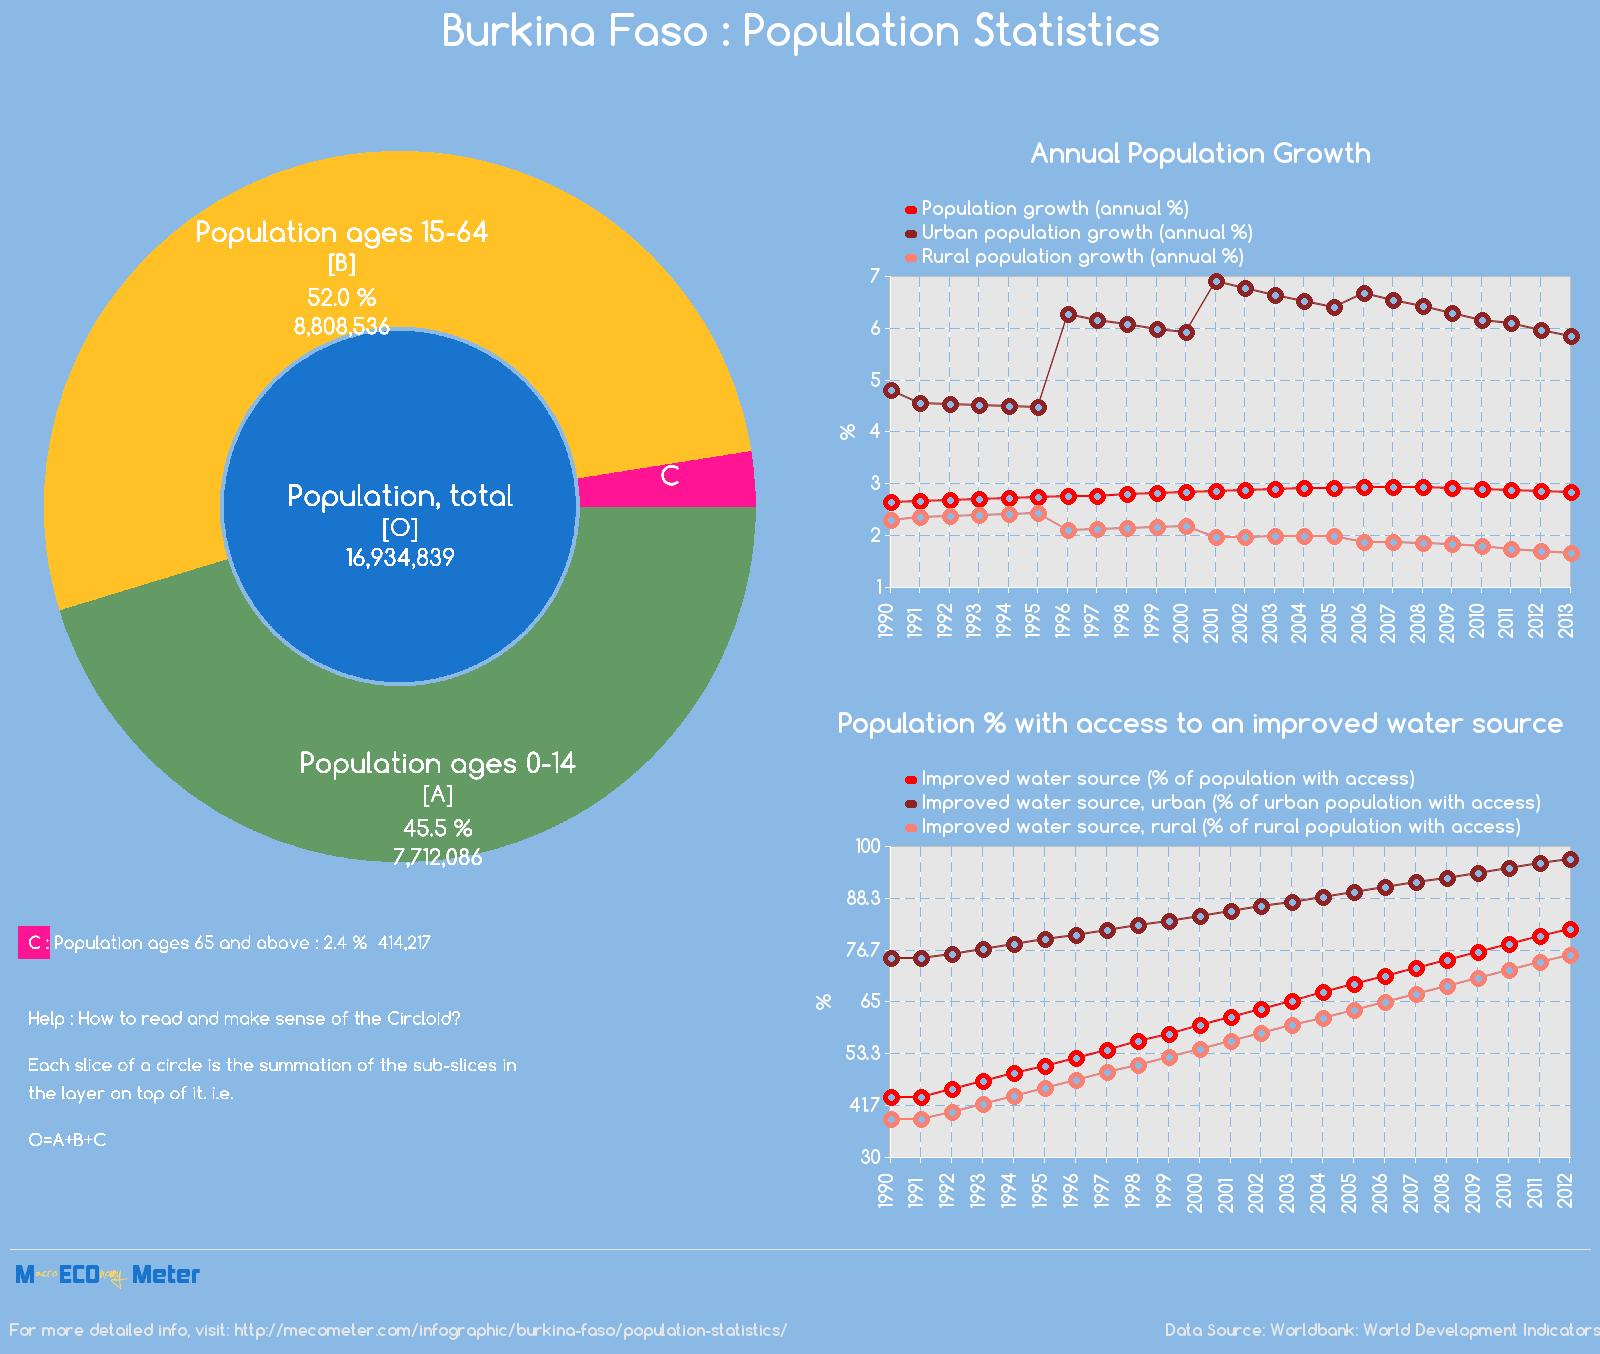 Burkina Faso : Population Statistics